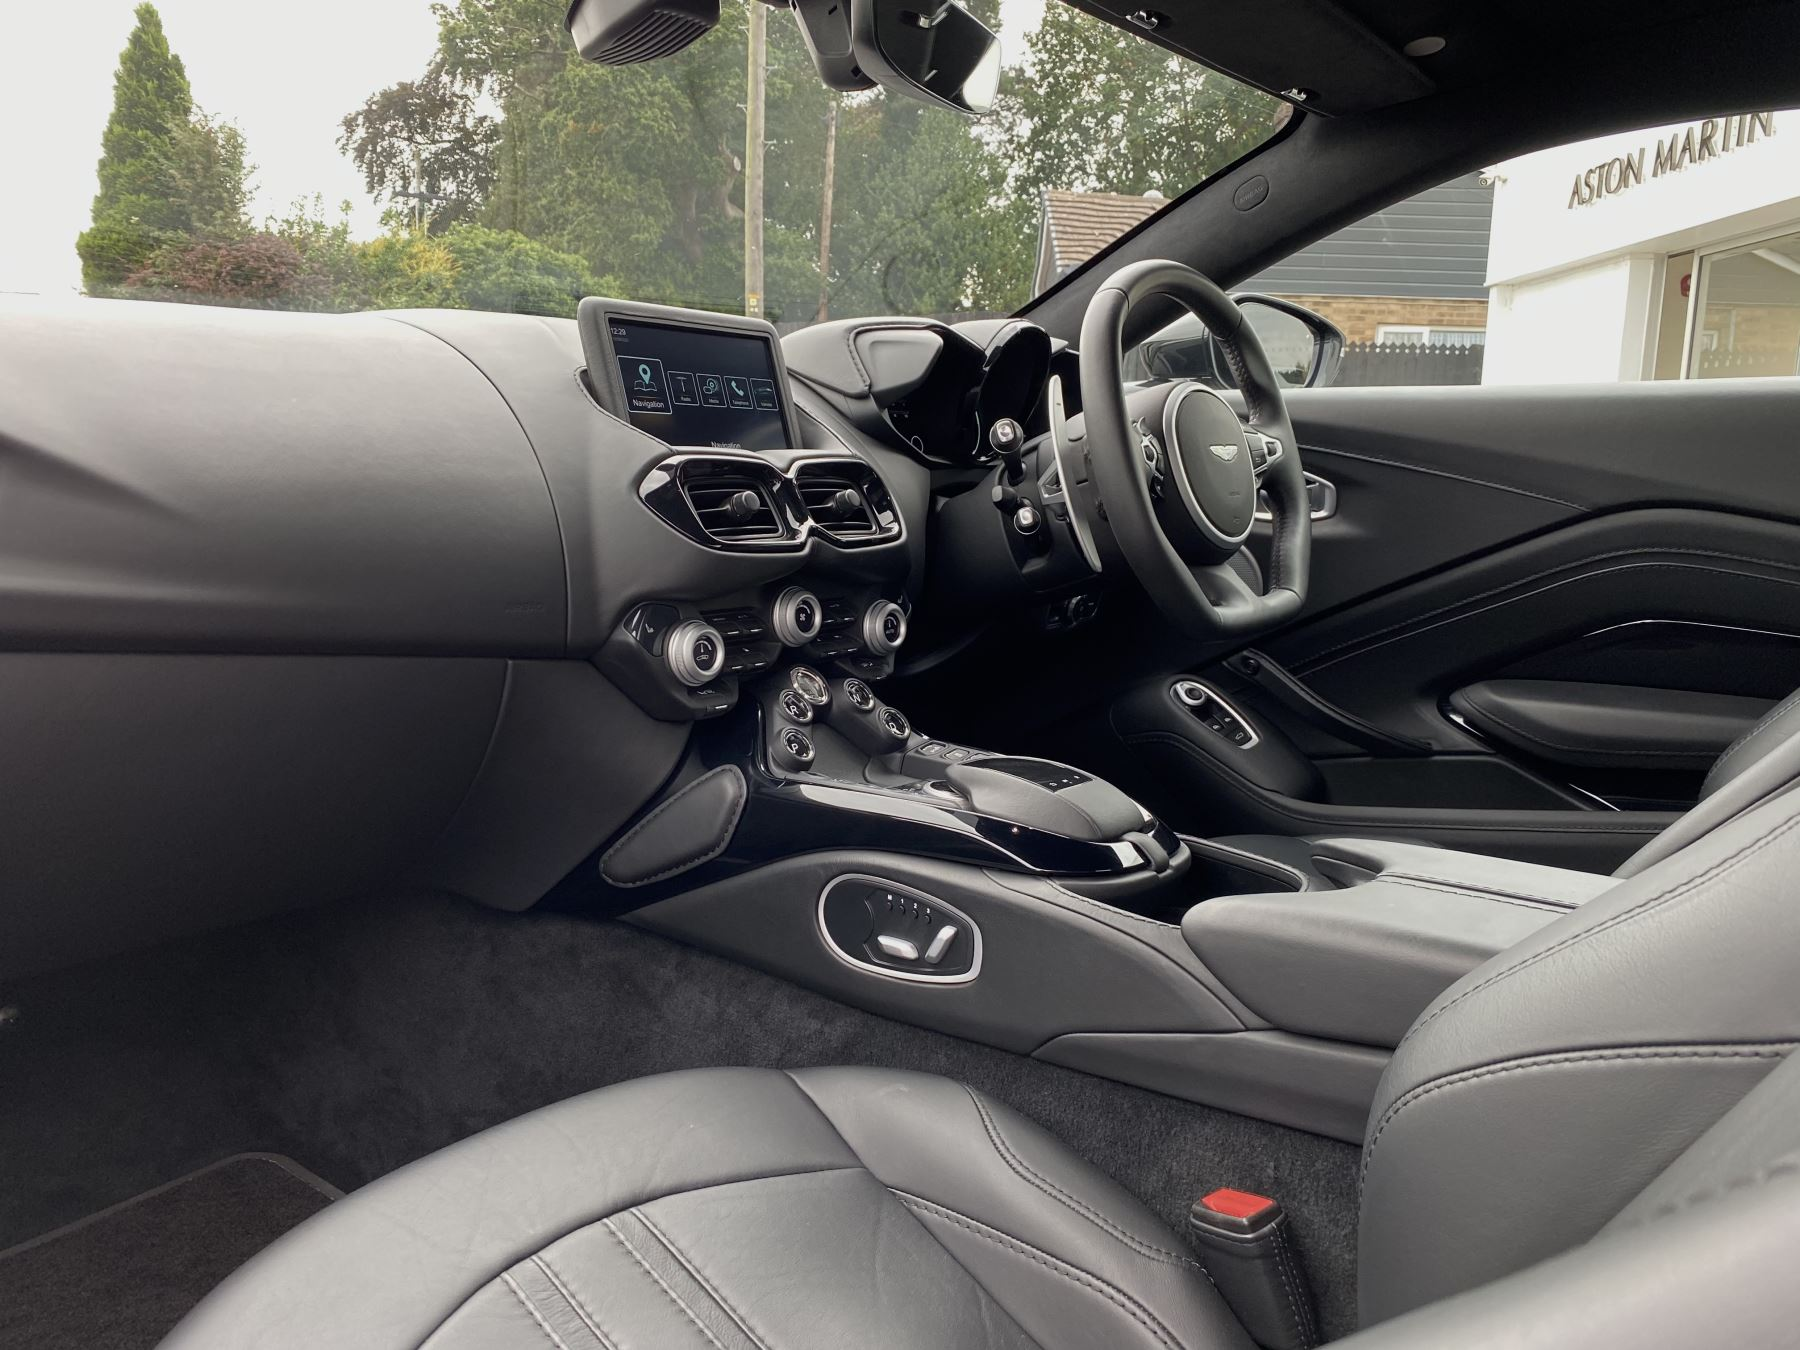 Aston Martin New Vantage 2dr ZF 8 Speed Auto. 4.0 Twin Turbo ZF Gearbox  Reversing Camera Heated Seats Ceramic Brakes image 24